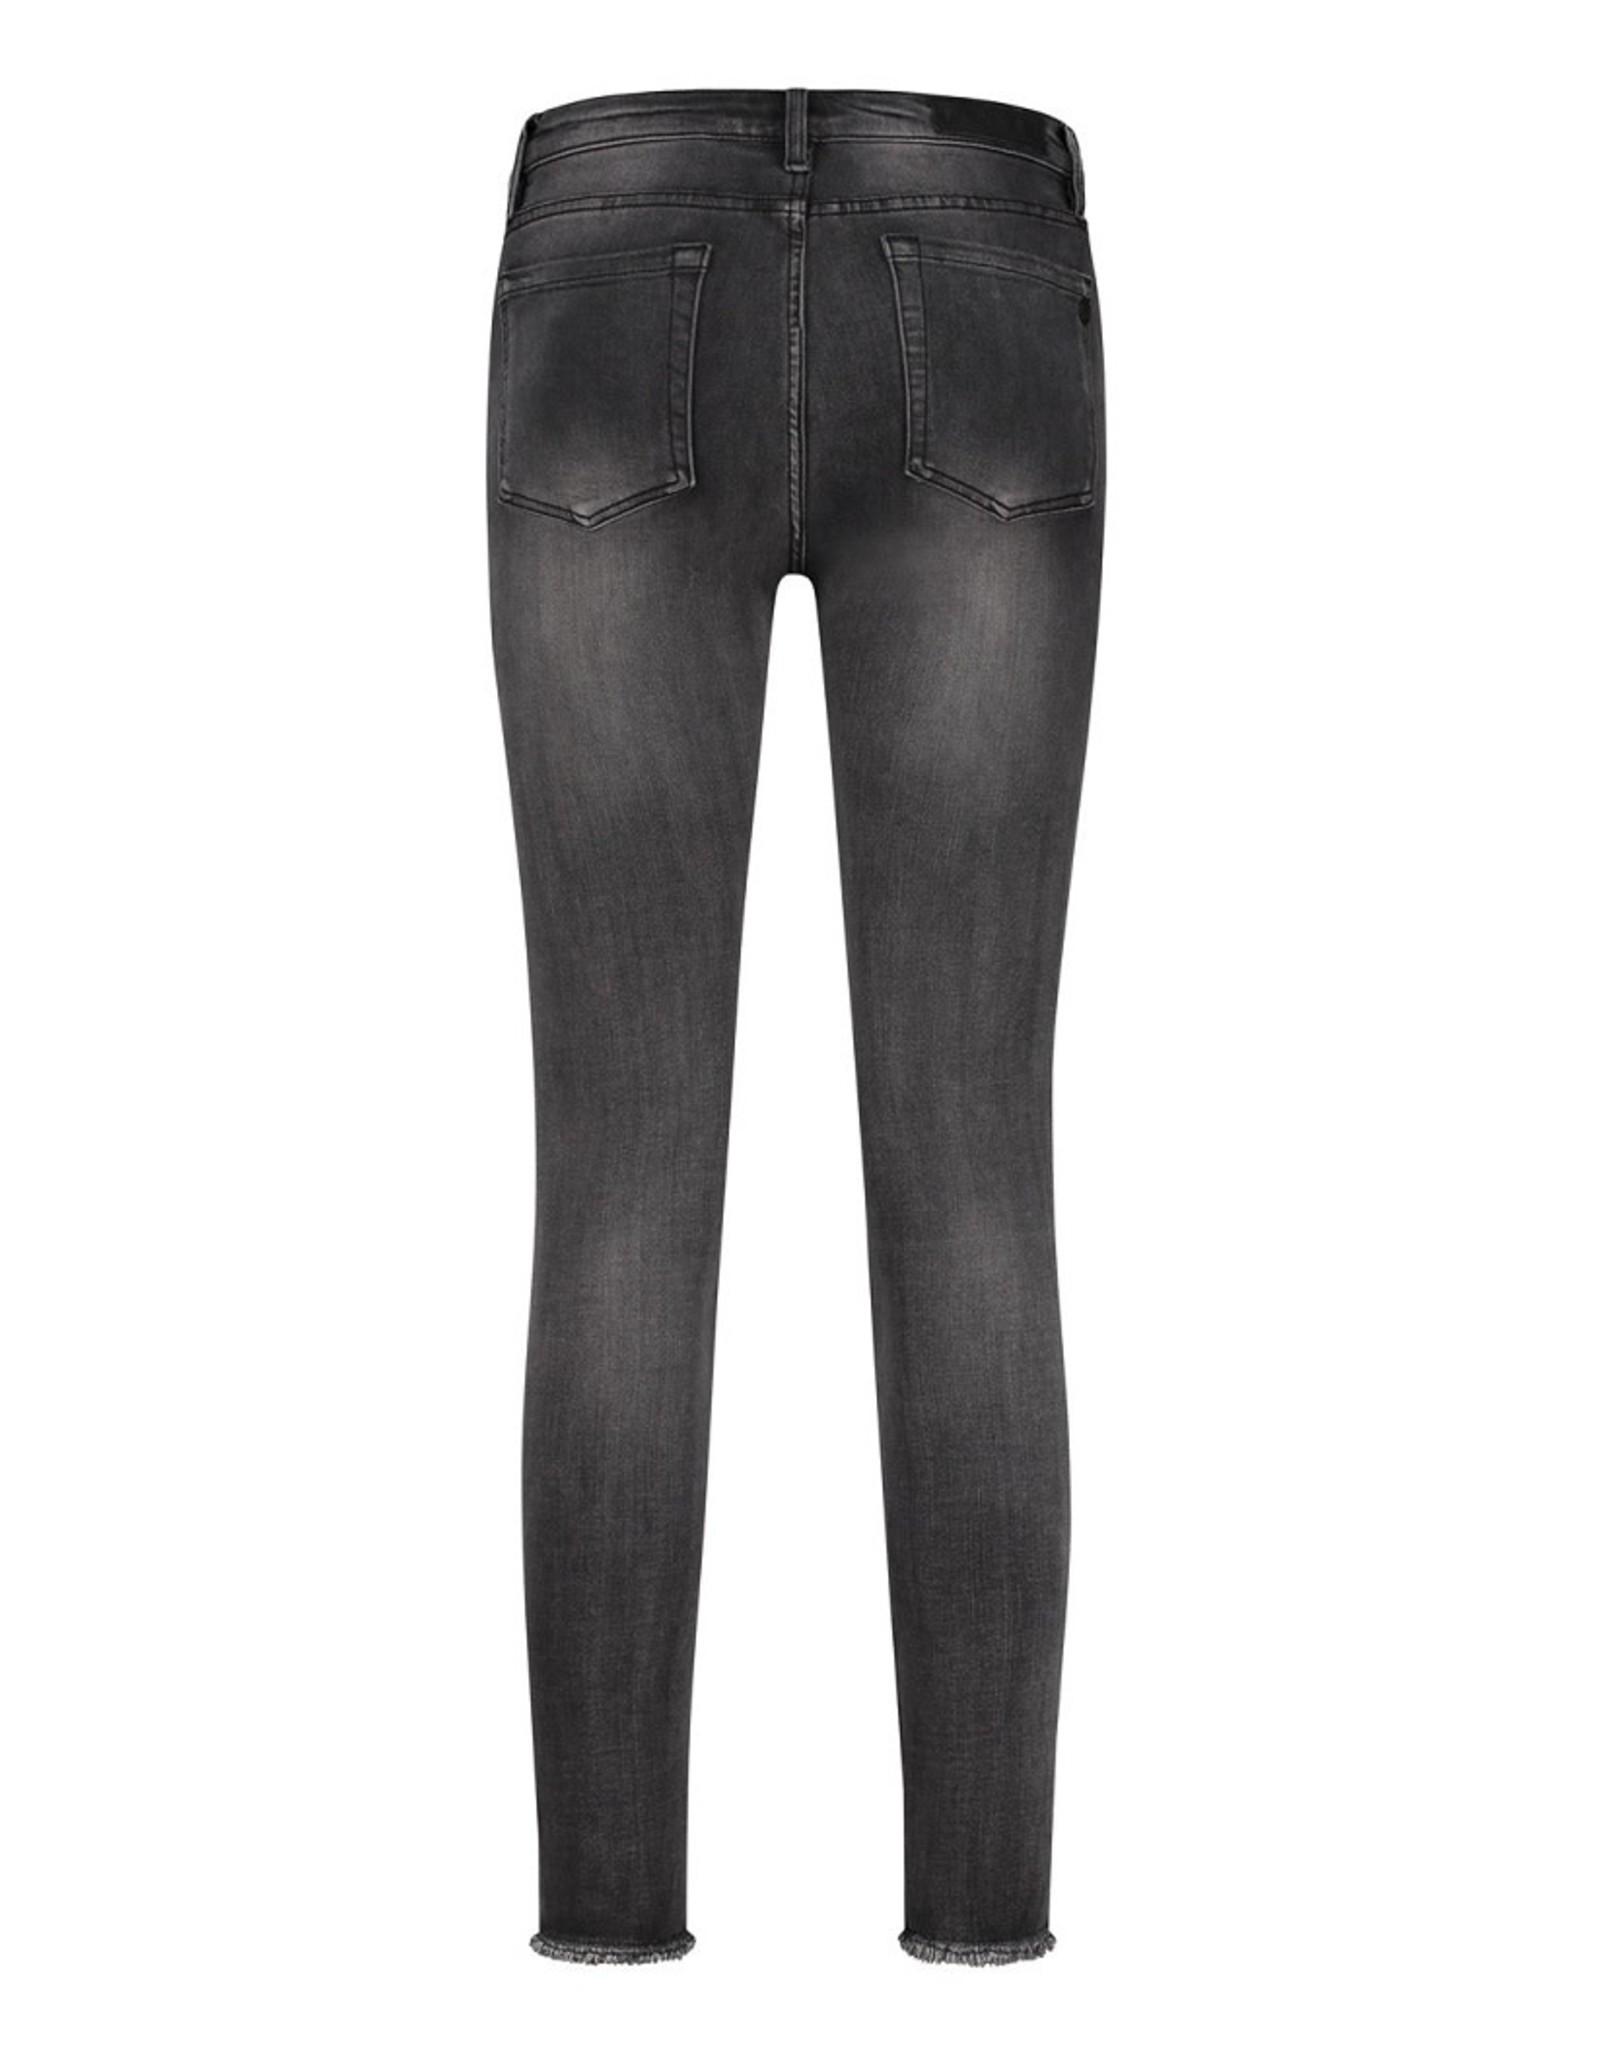 Florèz Florez Bobbi jeans Gracell black